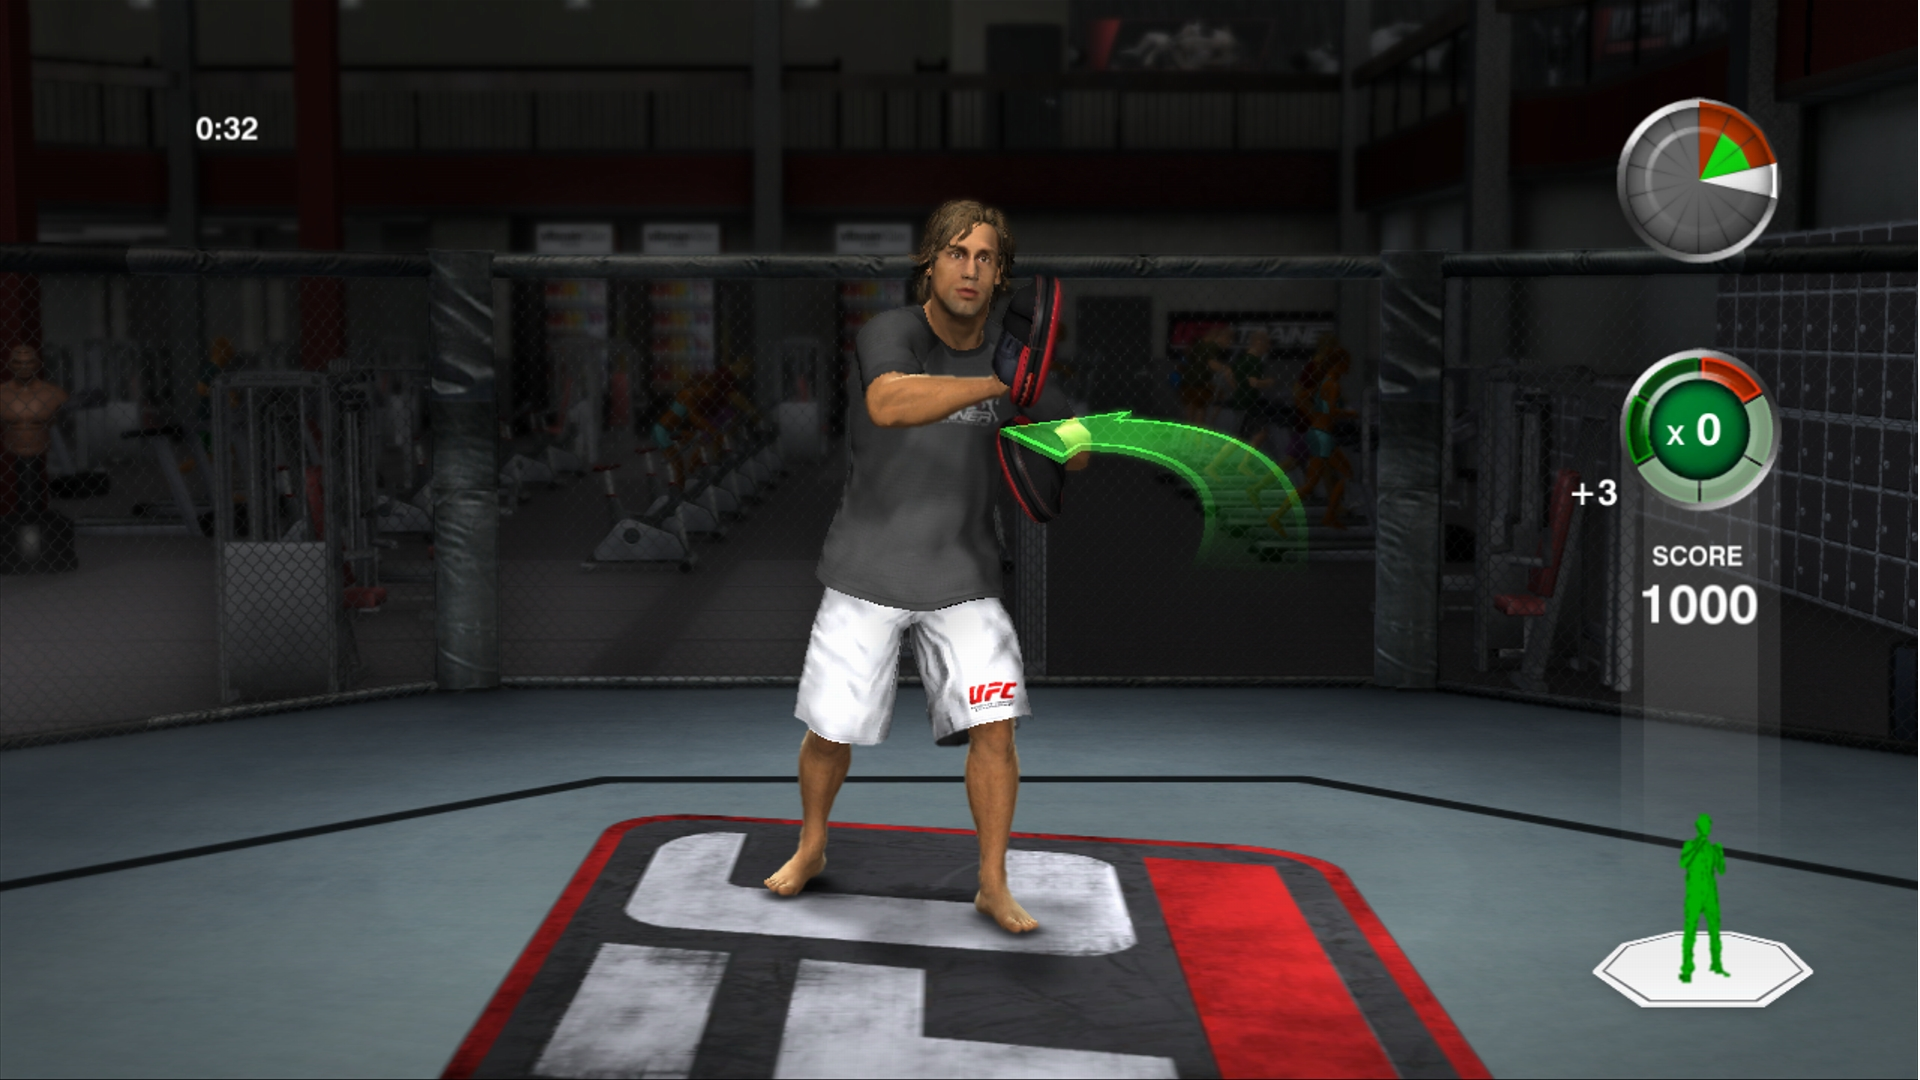 THQ odhaluje trenažér UFC Trainer + galerie 37279